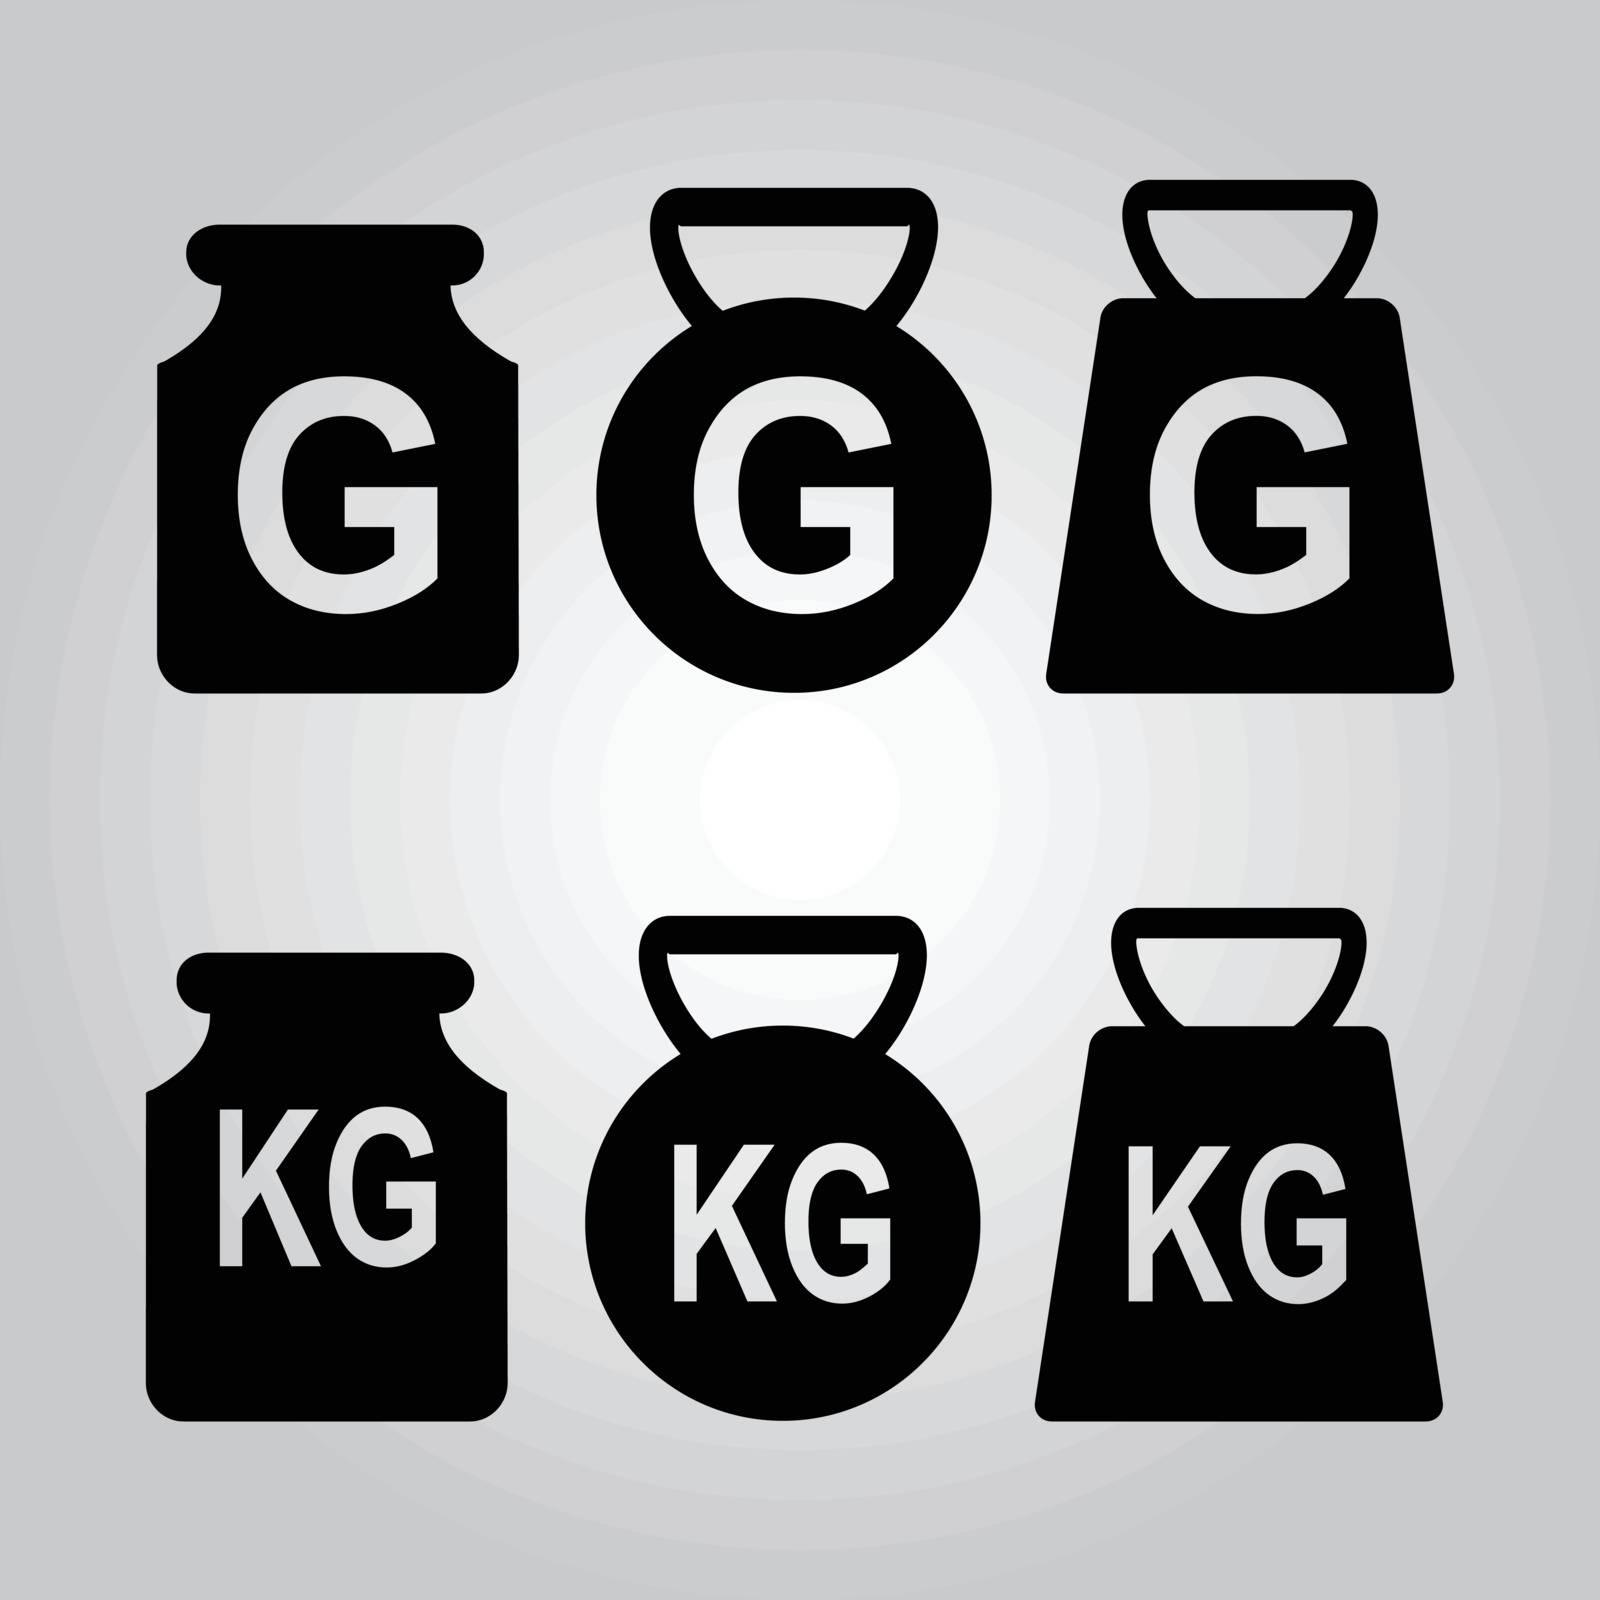 Weight icon, symbol vector illustration